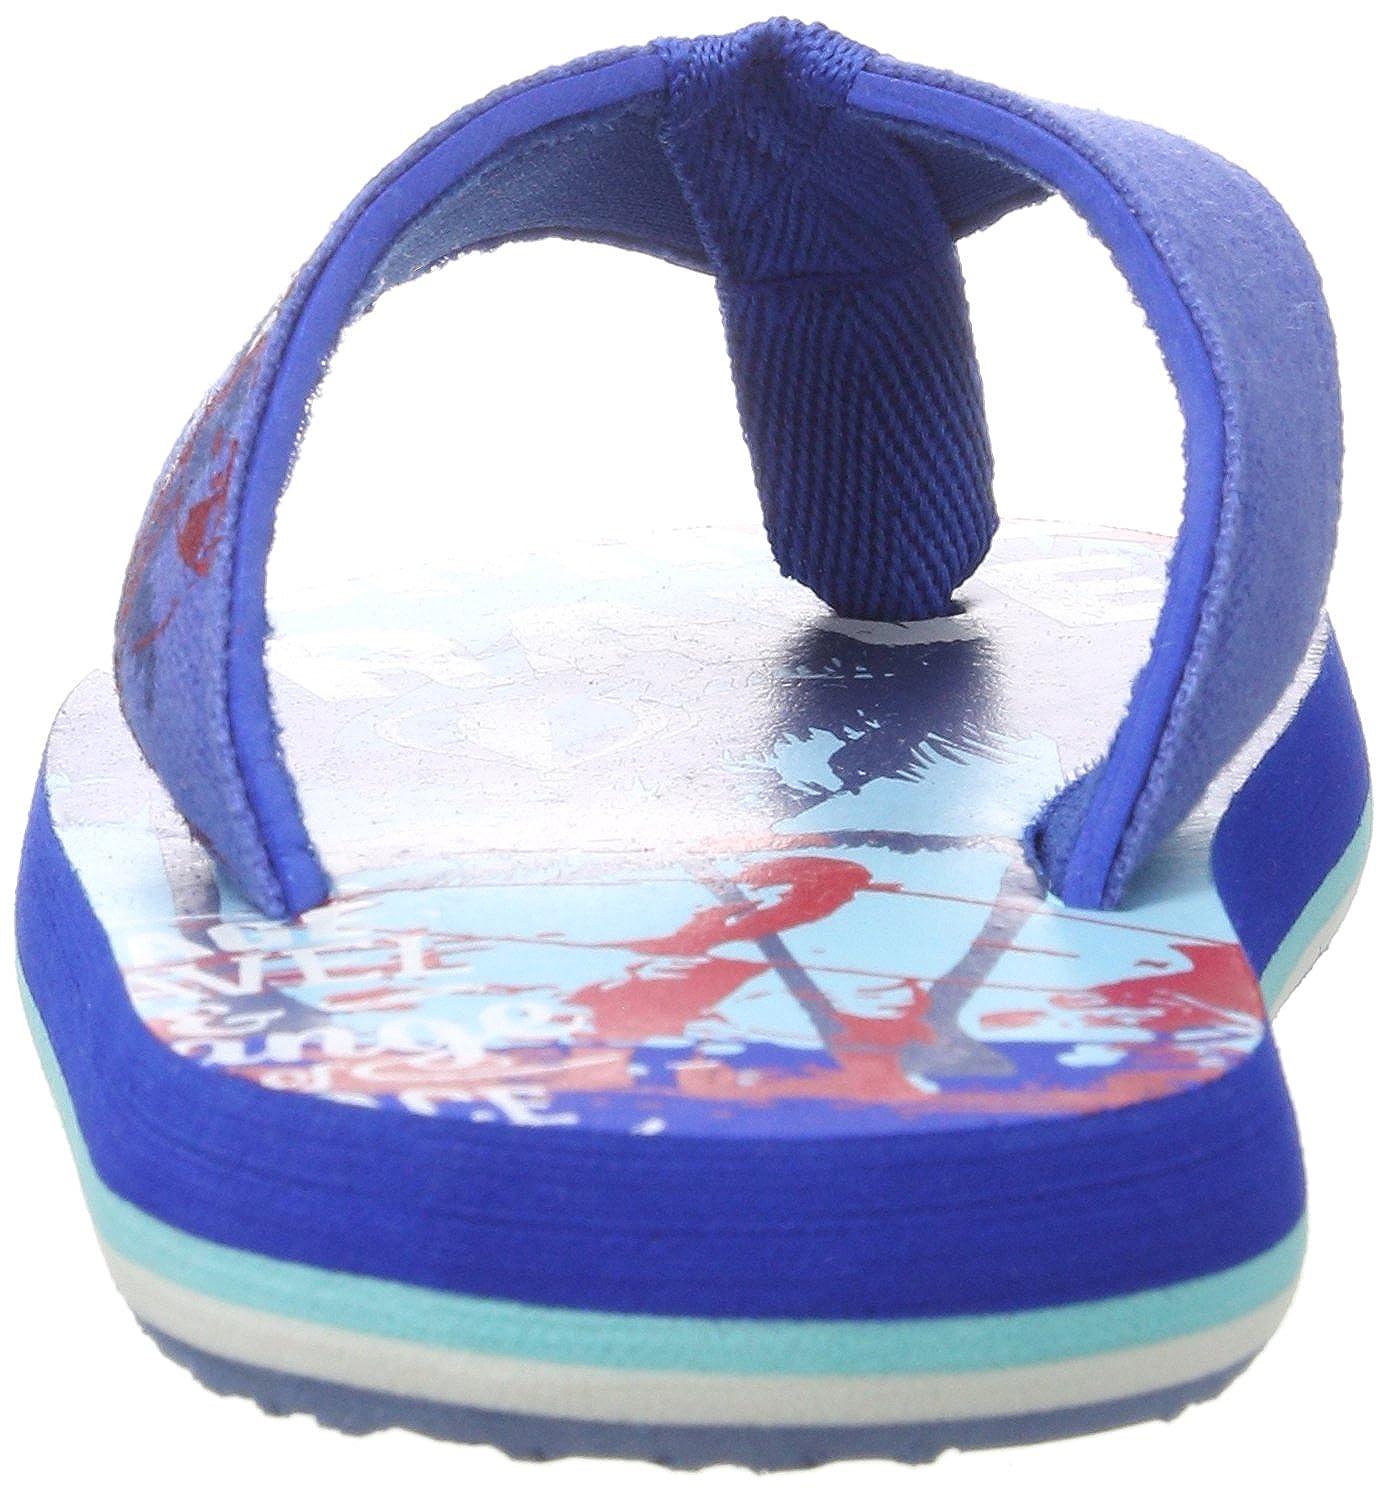 Beck Damen Slides Aqua Schuhe